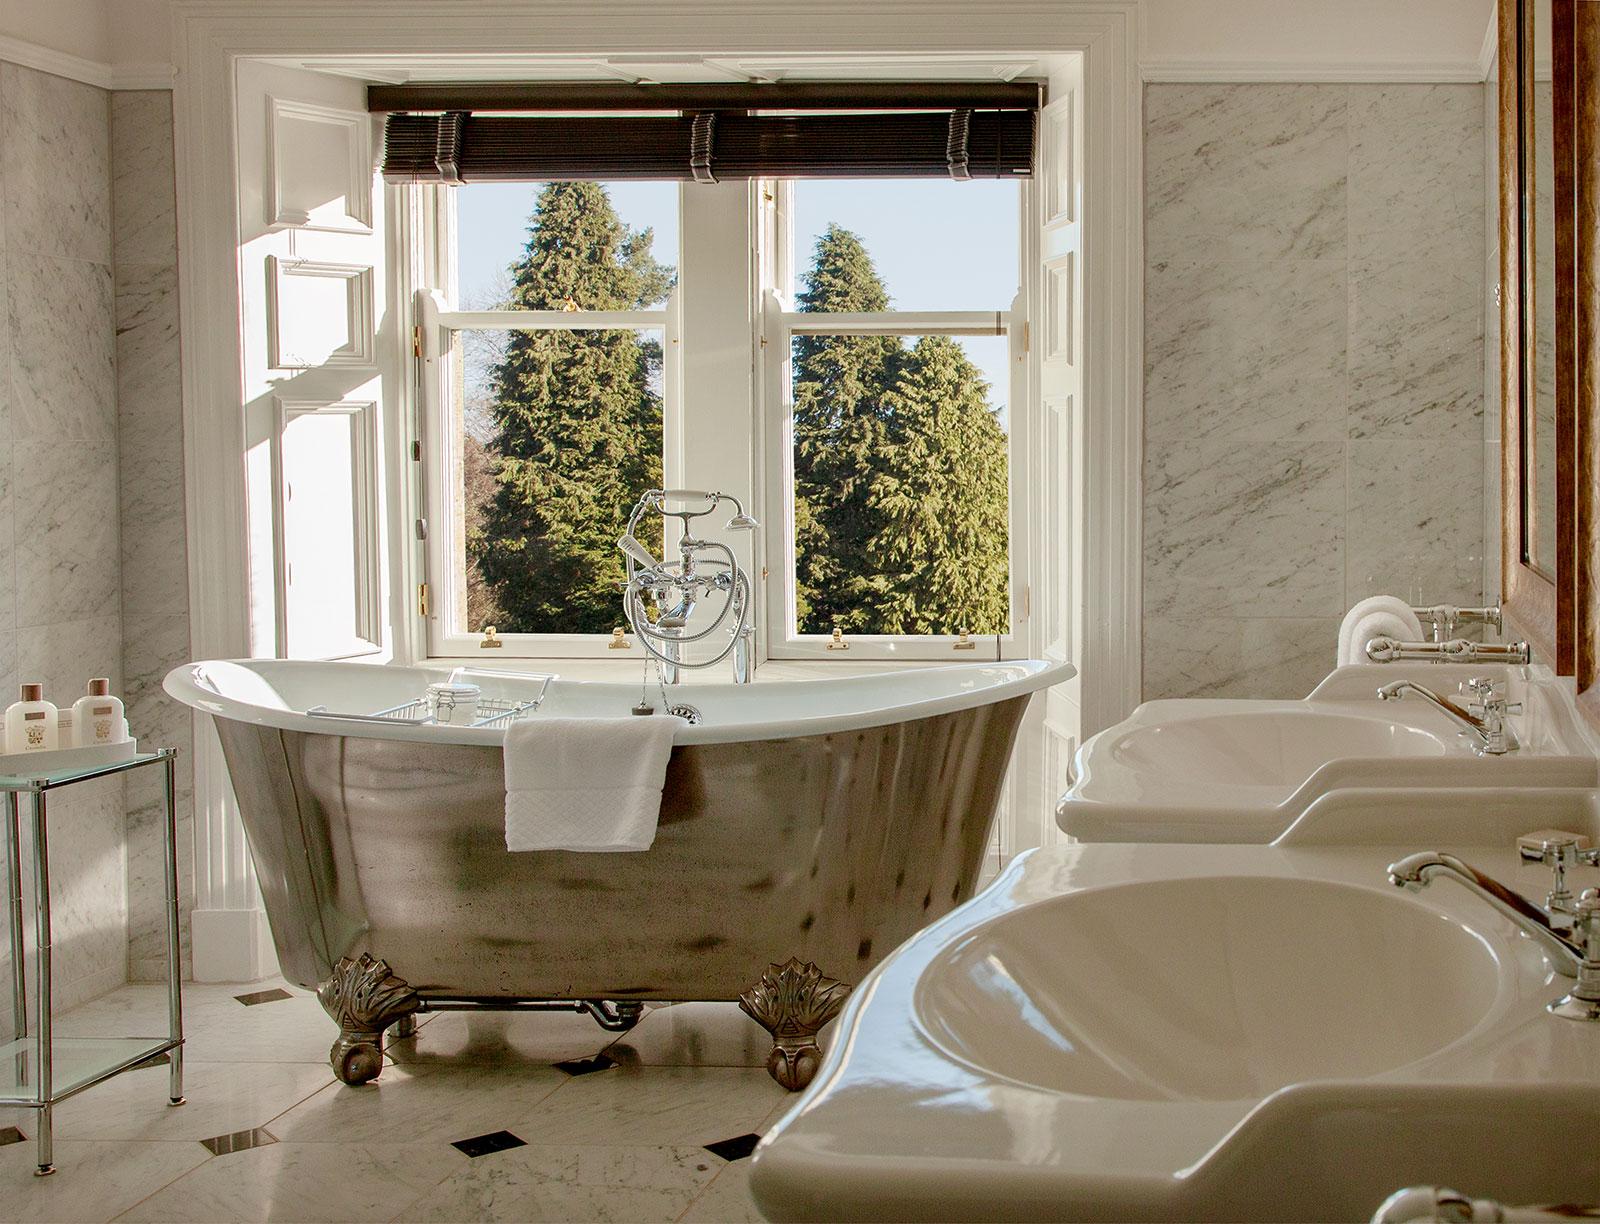 Cromlix Hotel Bath Vignette The-Ducker